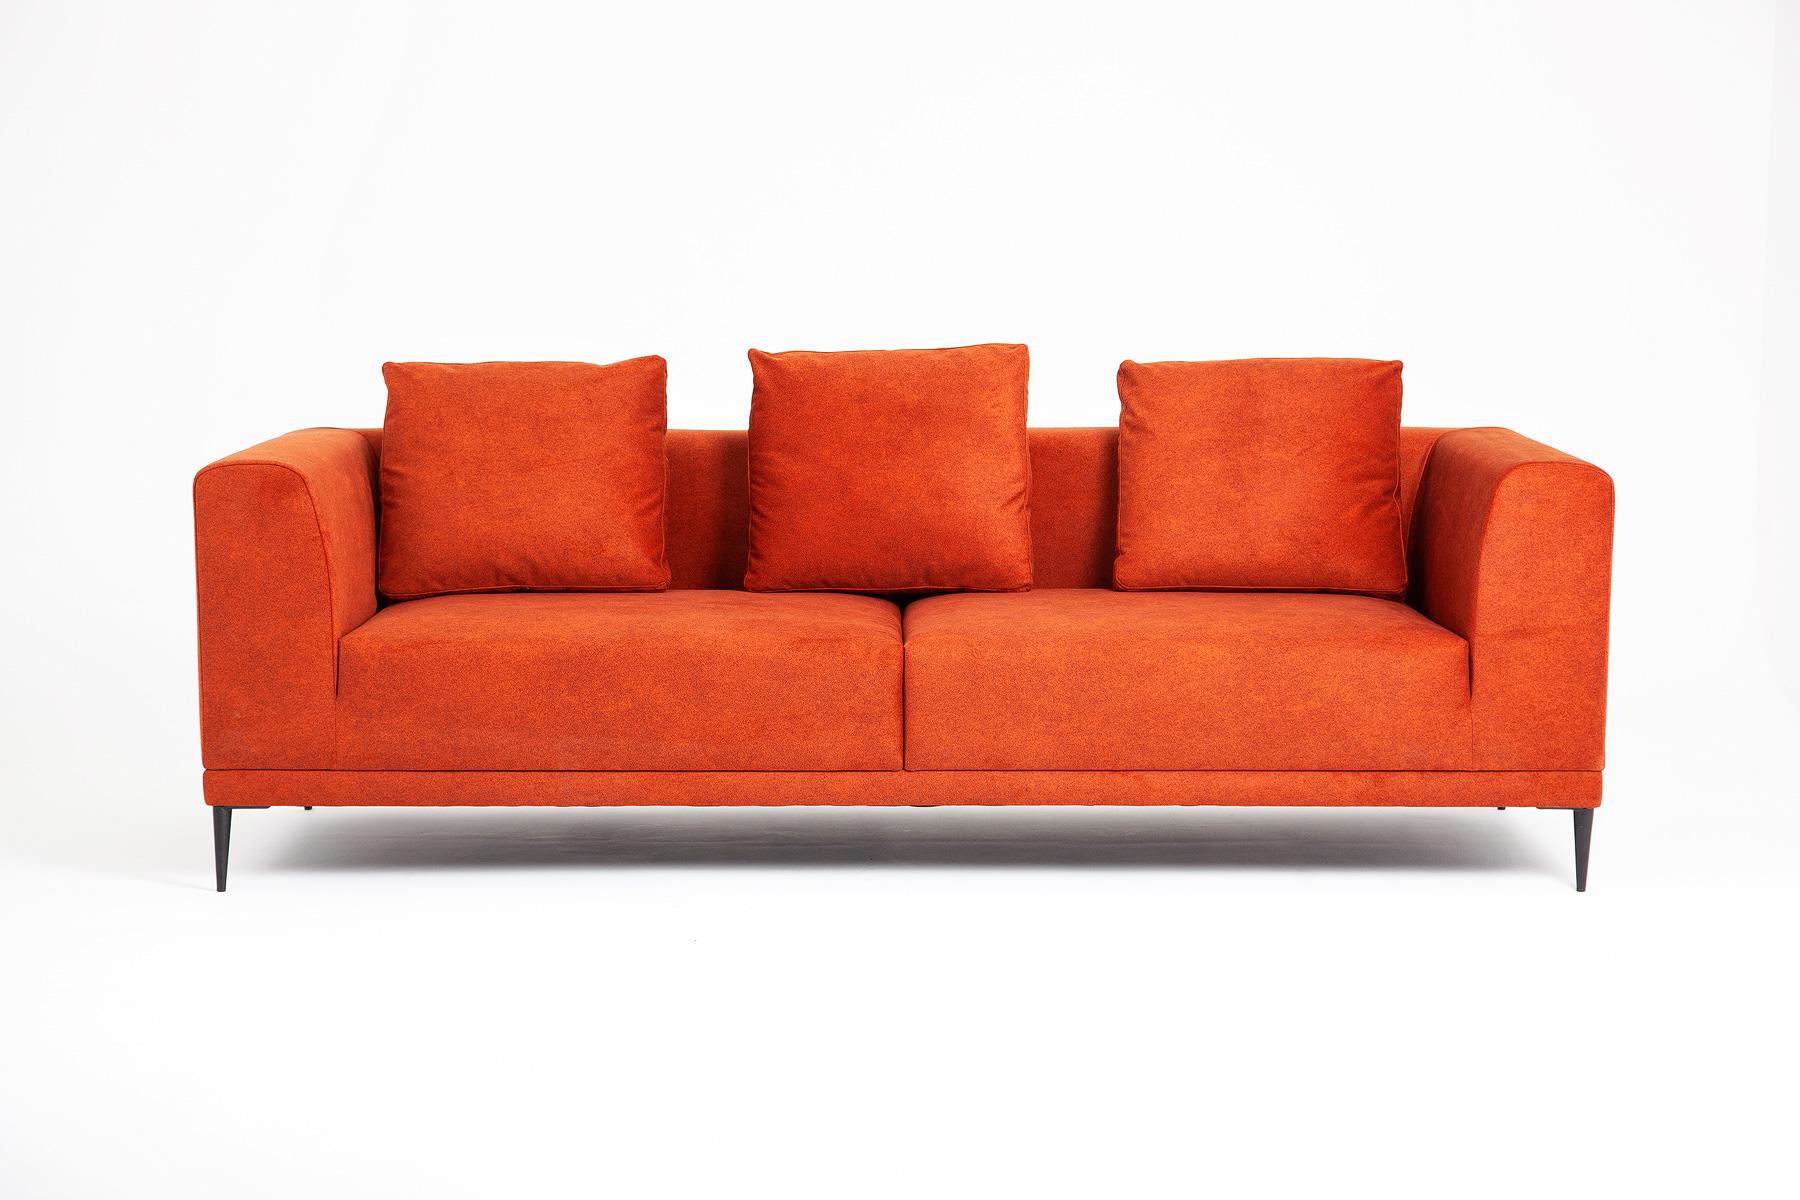 Bespoke_orange_fabric_3_seater_sofa_Davenport_Urvission_Interiors